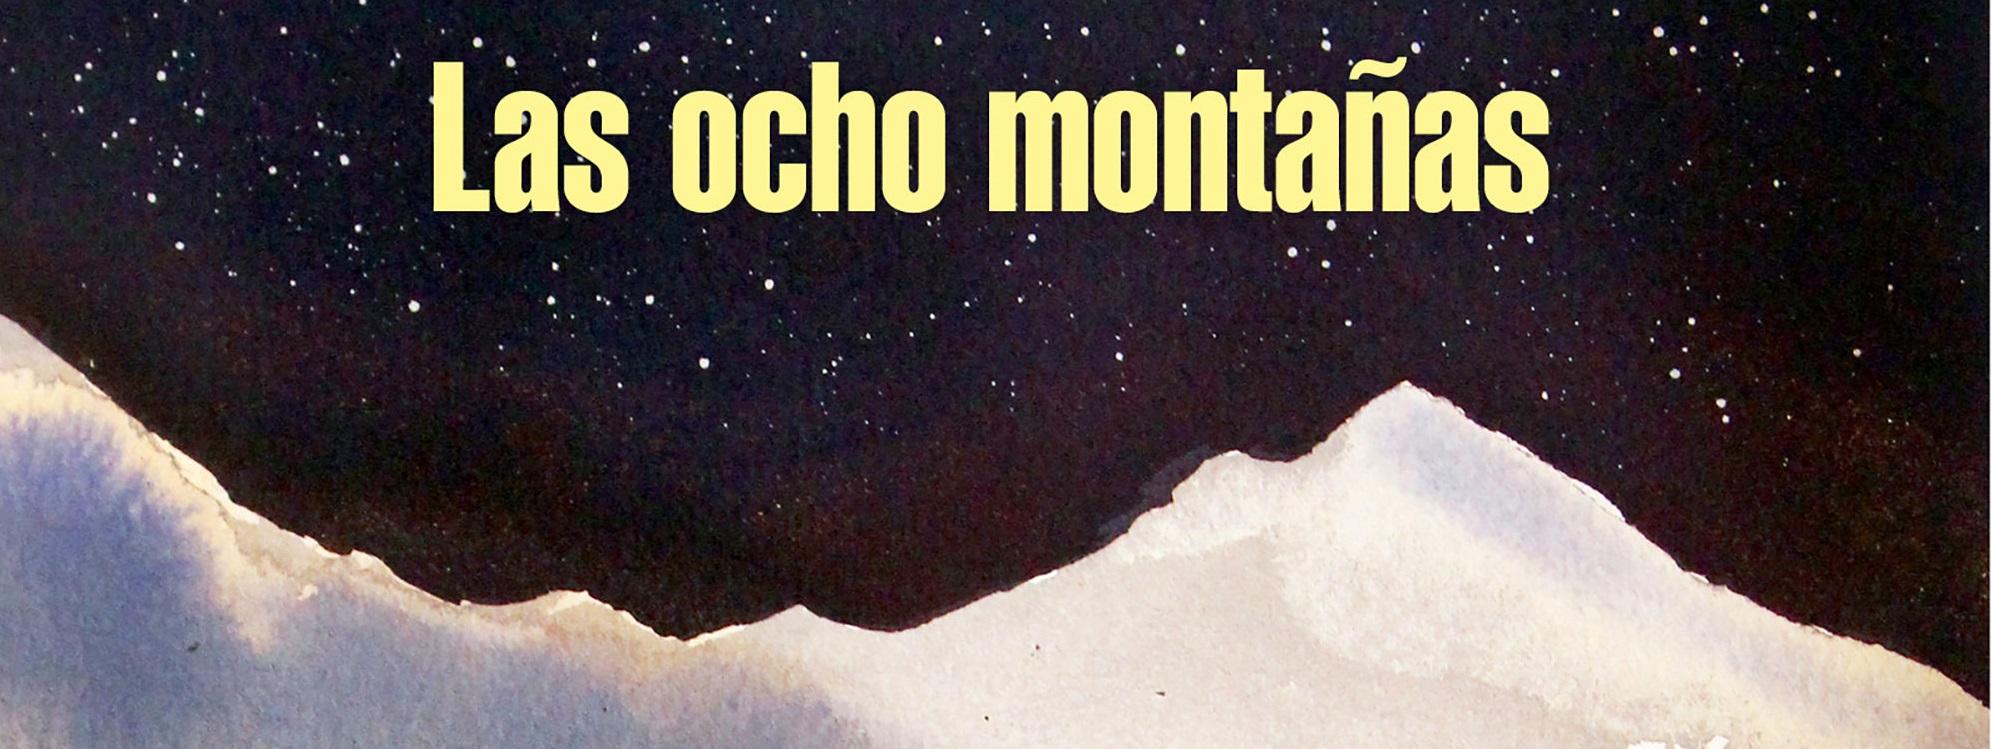 """Las ocho montañas"""